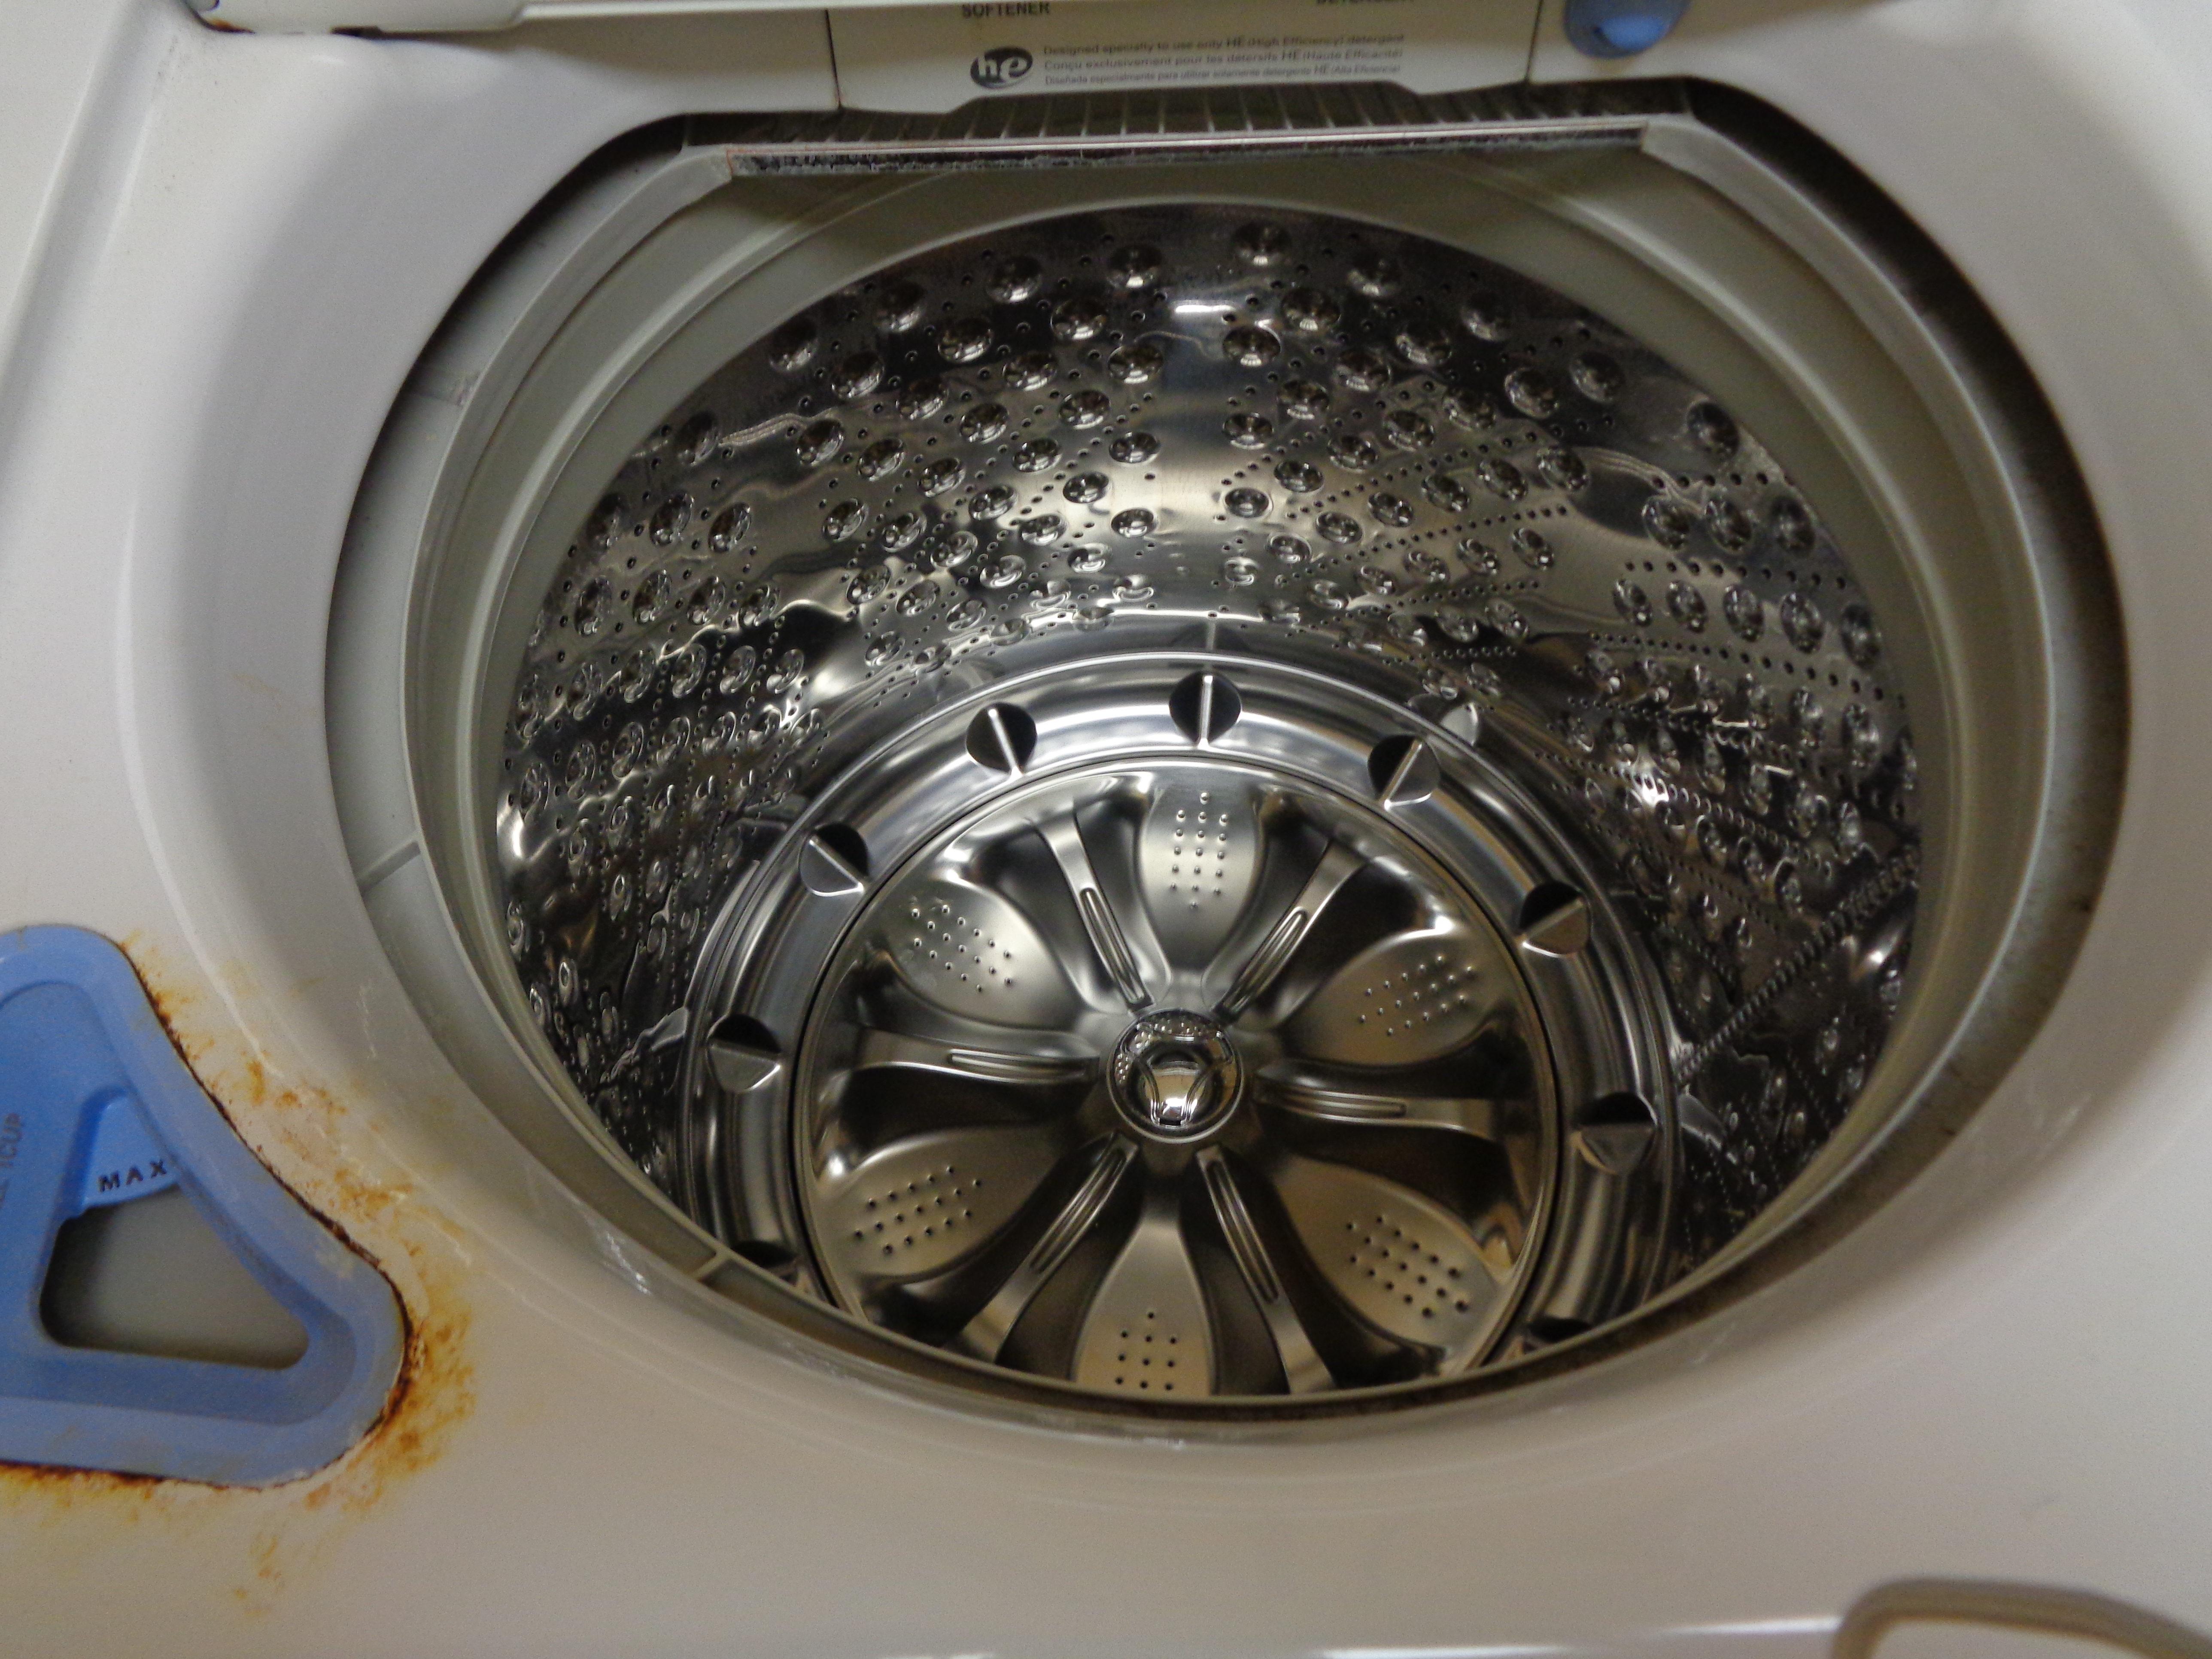 lg front load washing machine problems